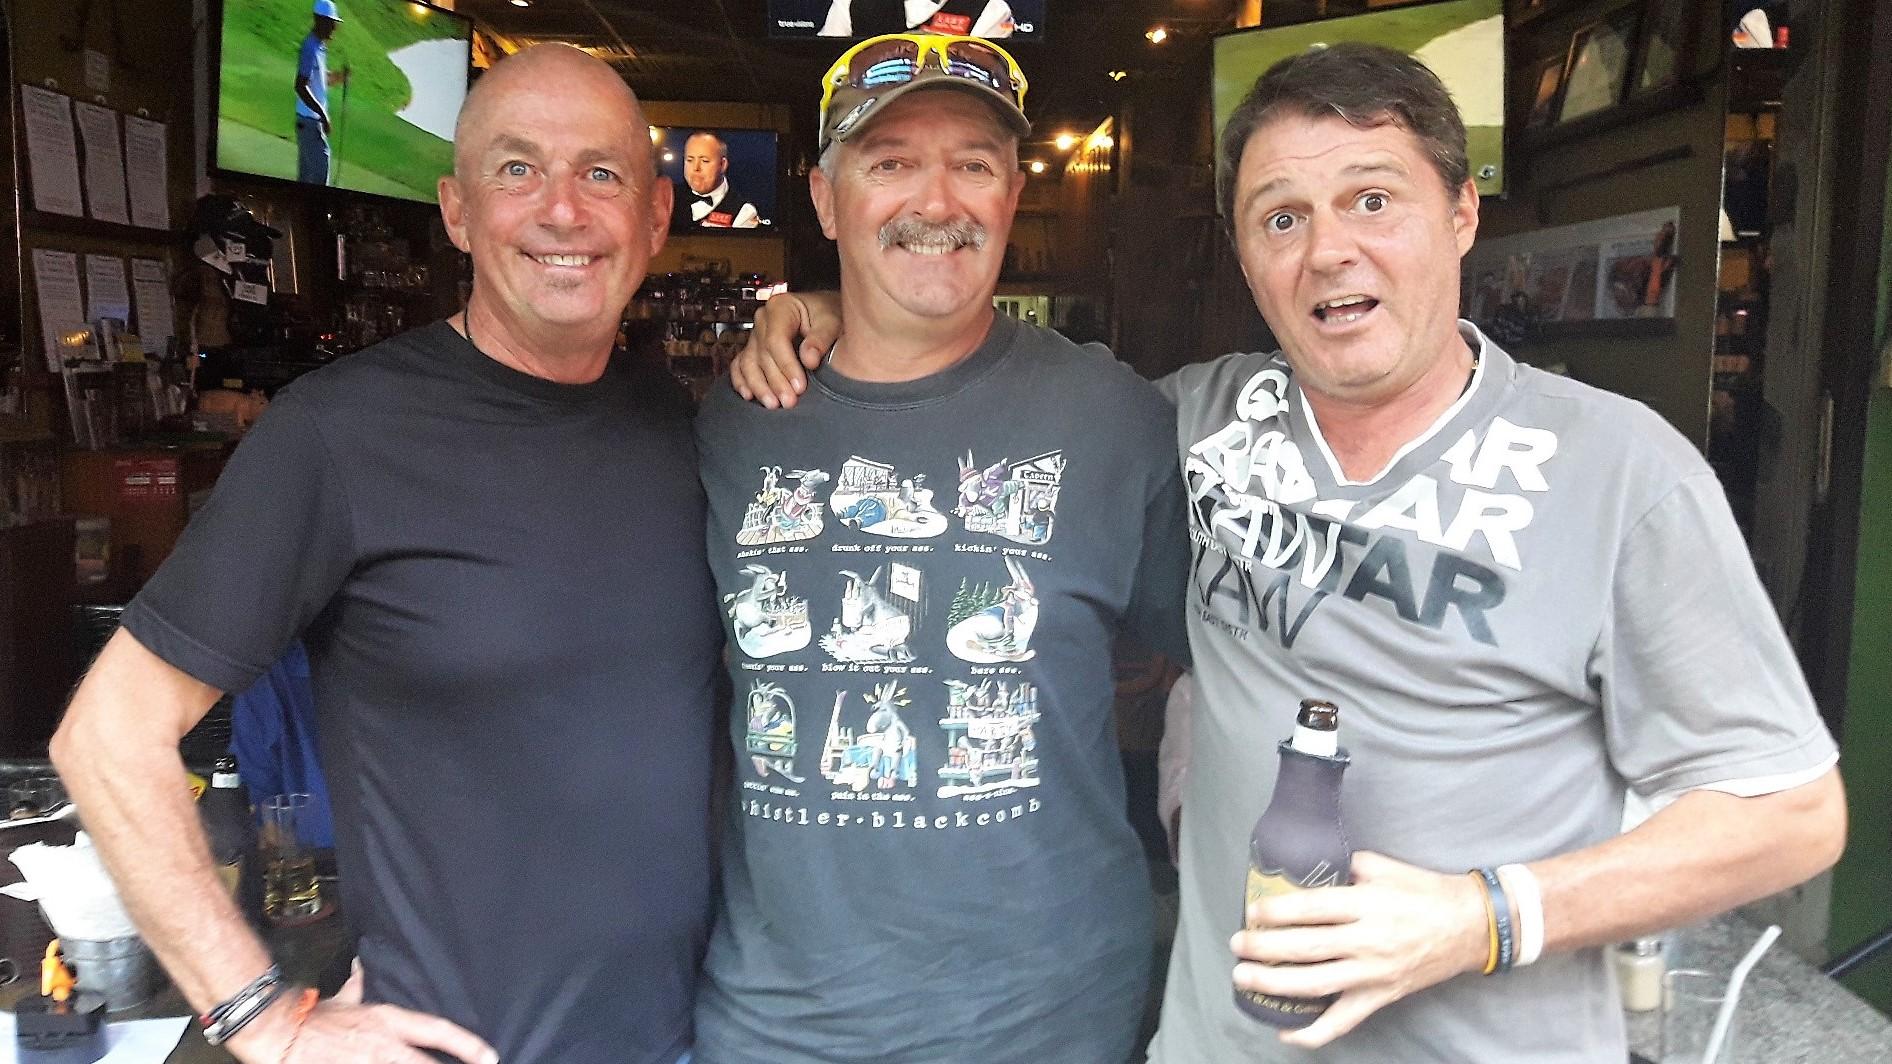 Phil, Frank & Mark apr่s-golf.